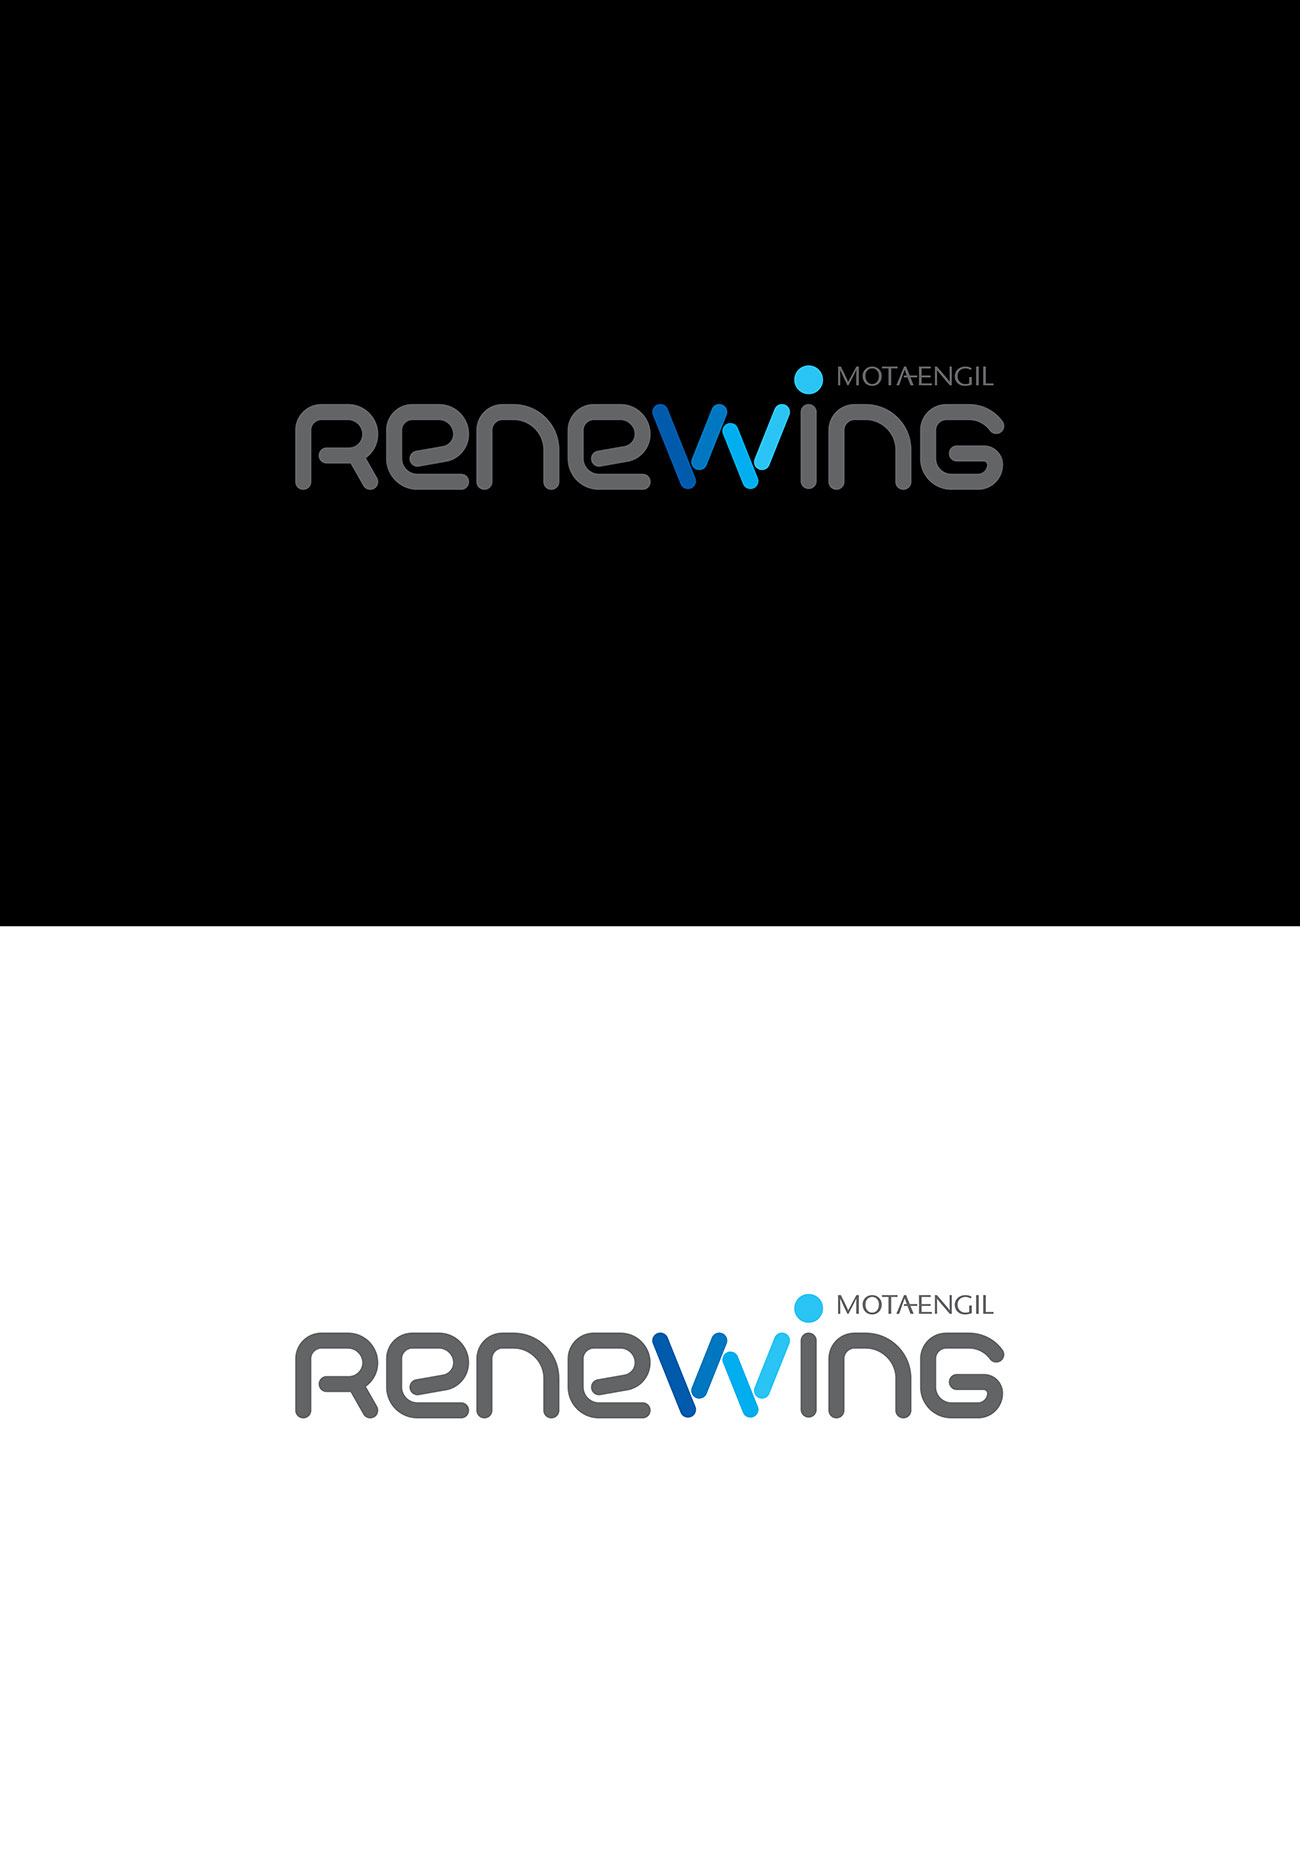 renewing_detalhe_1